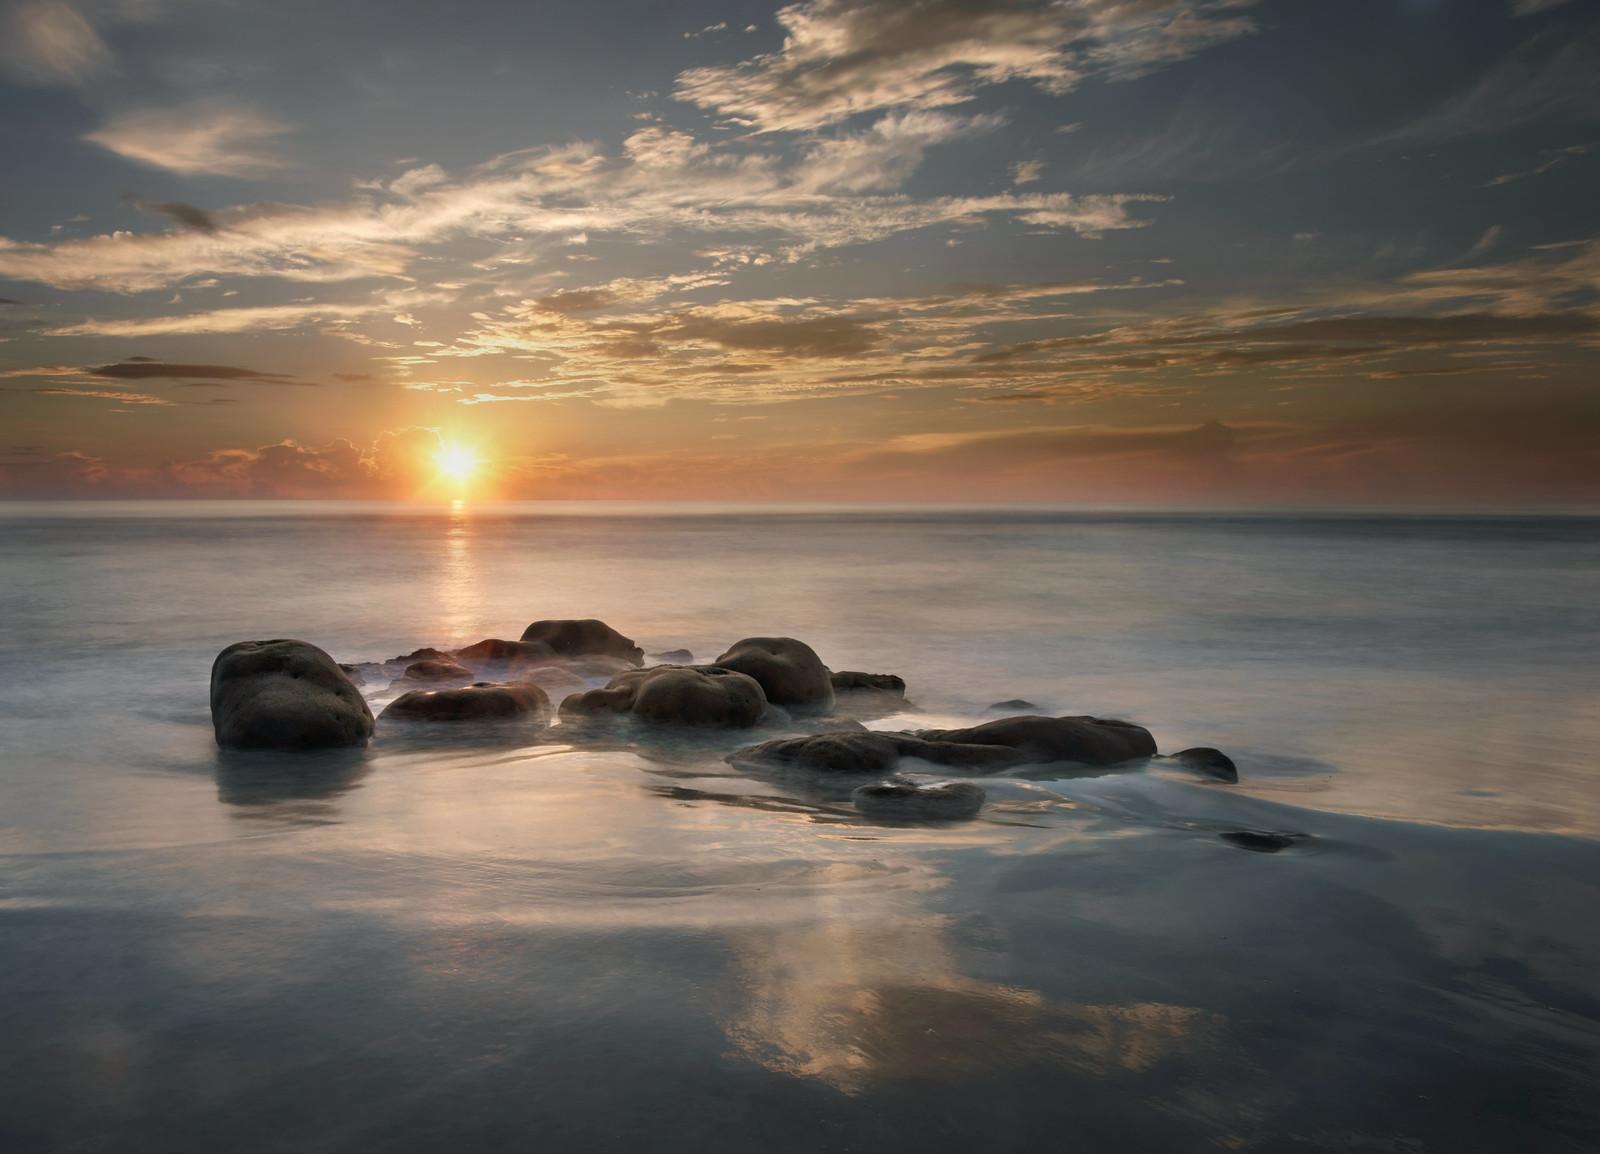 Peaceful morning at the Sabellariid worm reef, Satellite Beach, Florida, USA. [1600 x 1154] [OC]